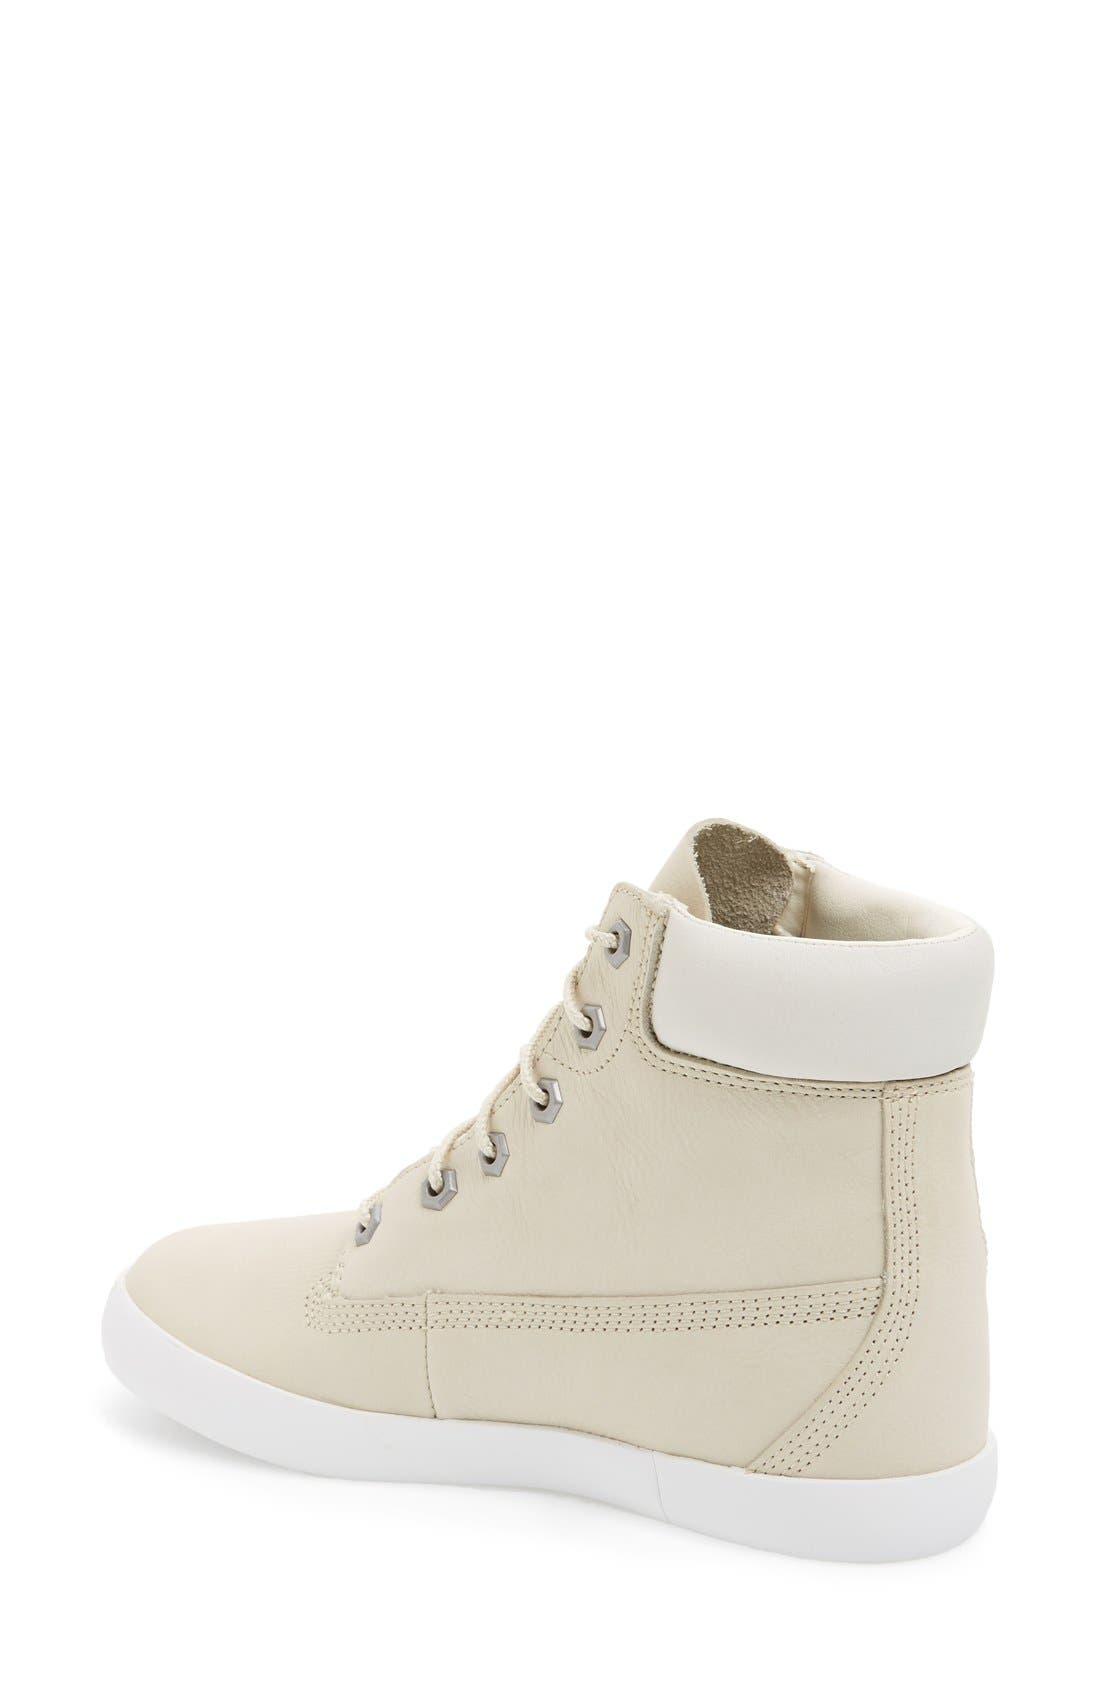 'Glastonbury Six Inch' Sneaker,                             Alternate thumbnail 2, color,                             Bone Leather